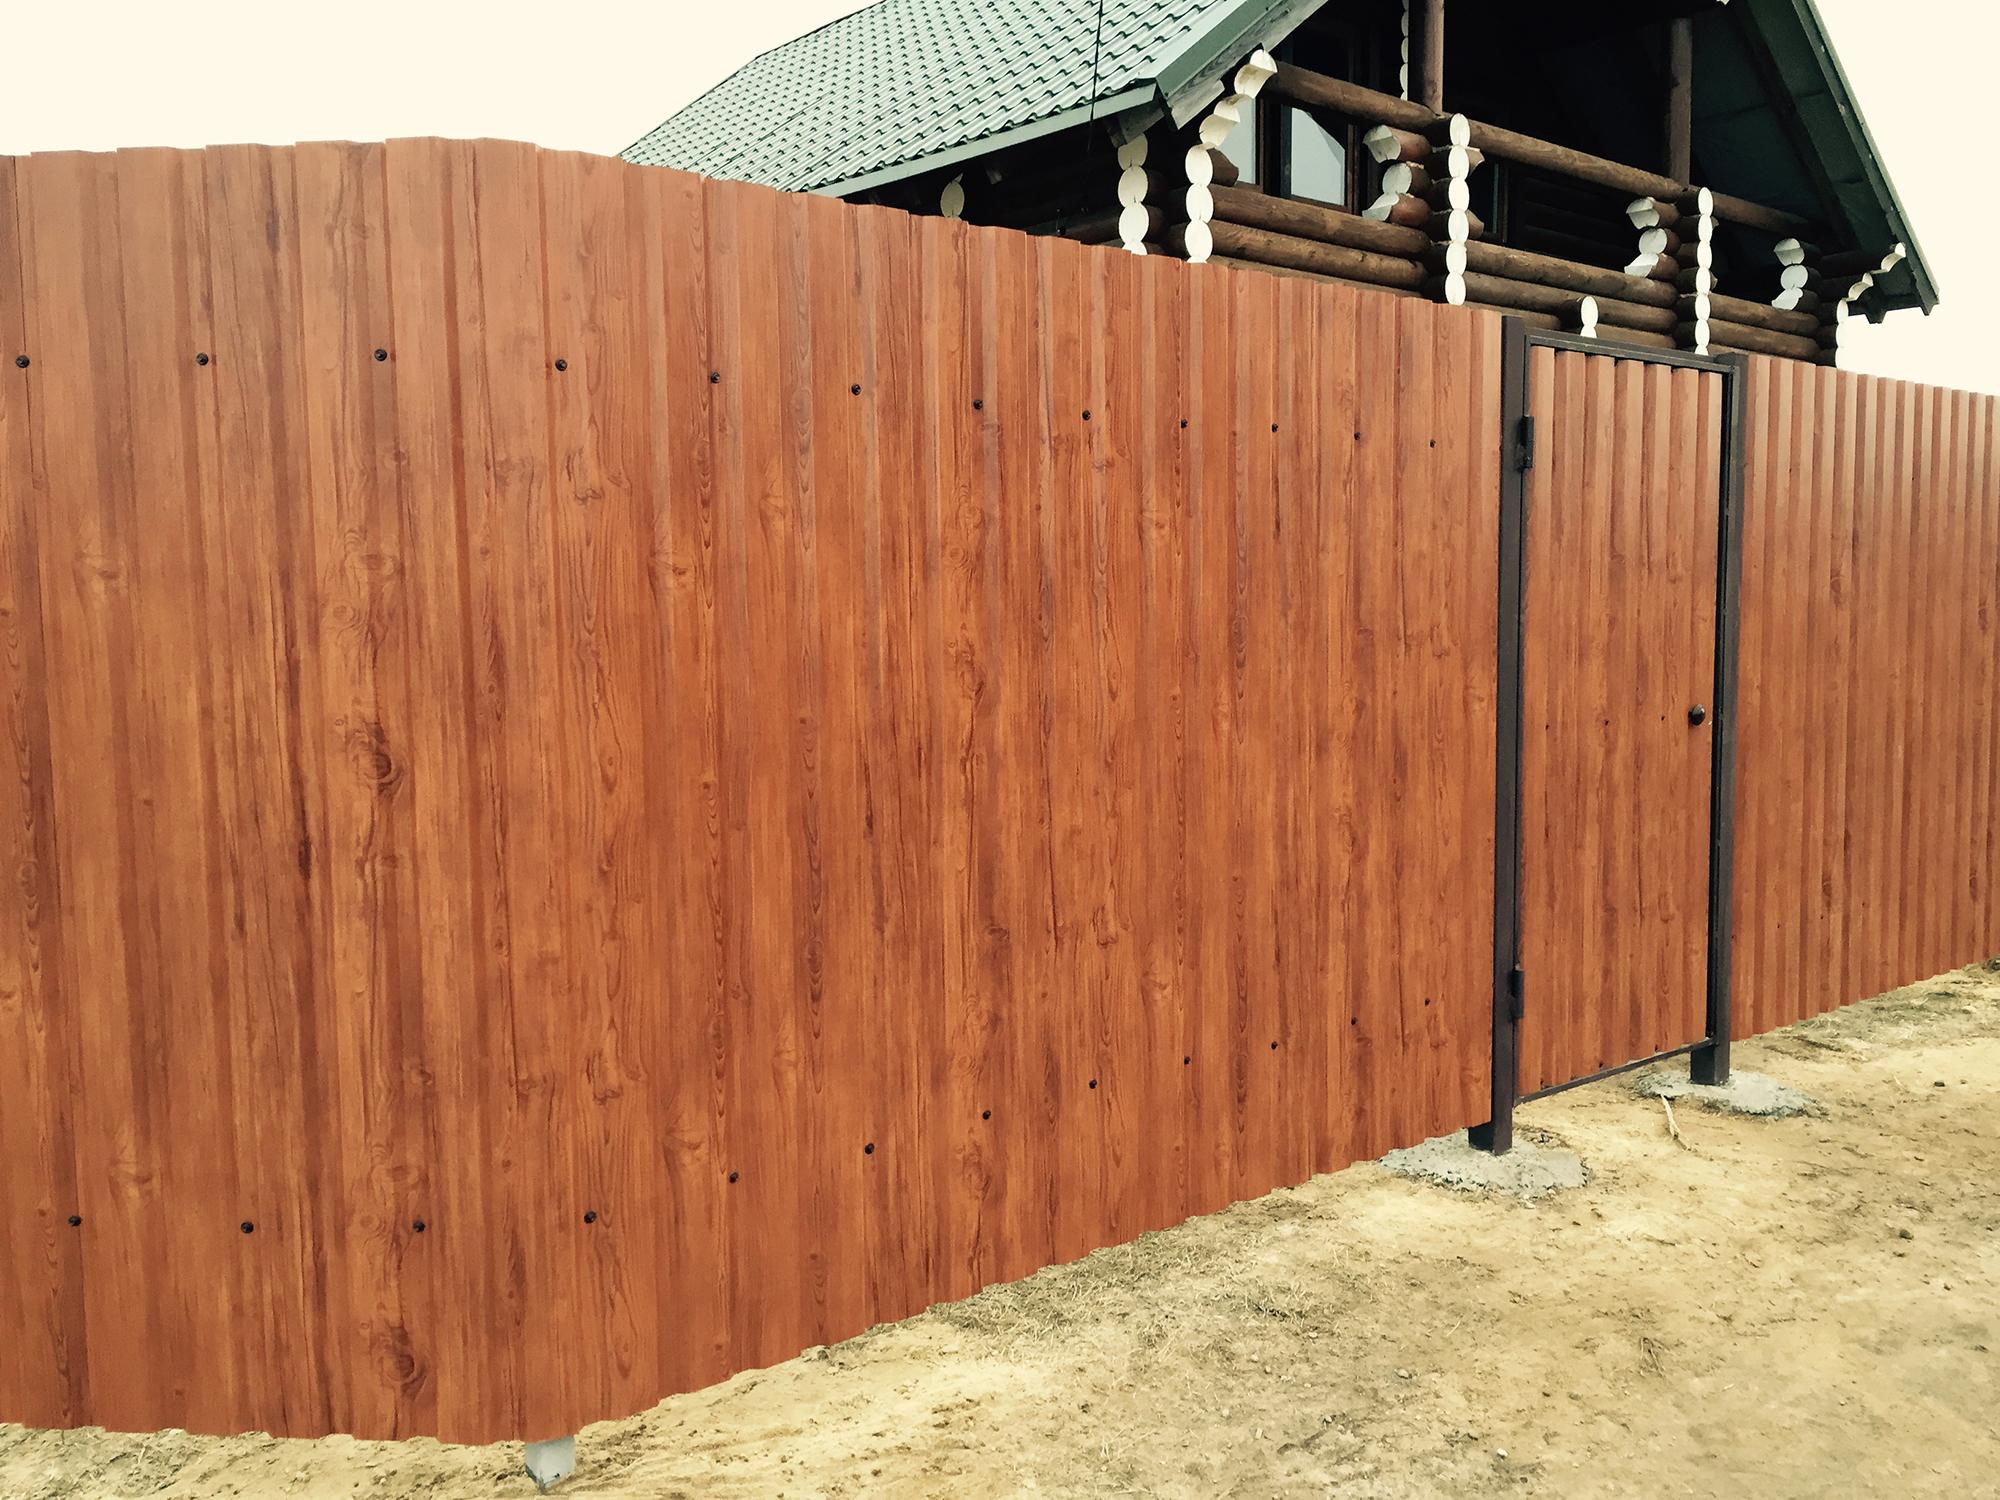 Забор из профнастила с рисунком под дерево